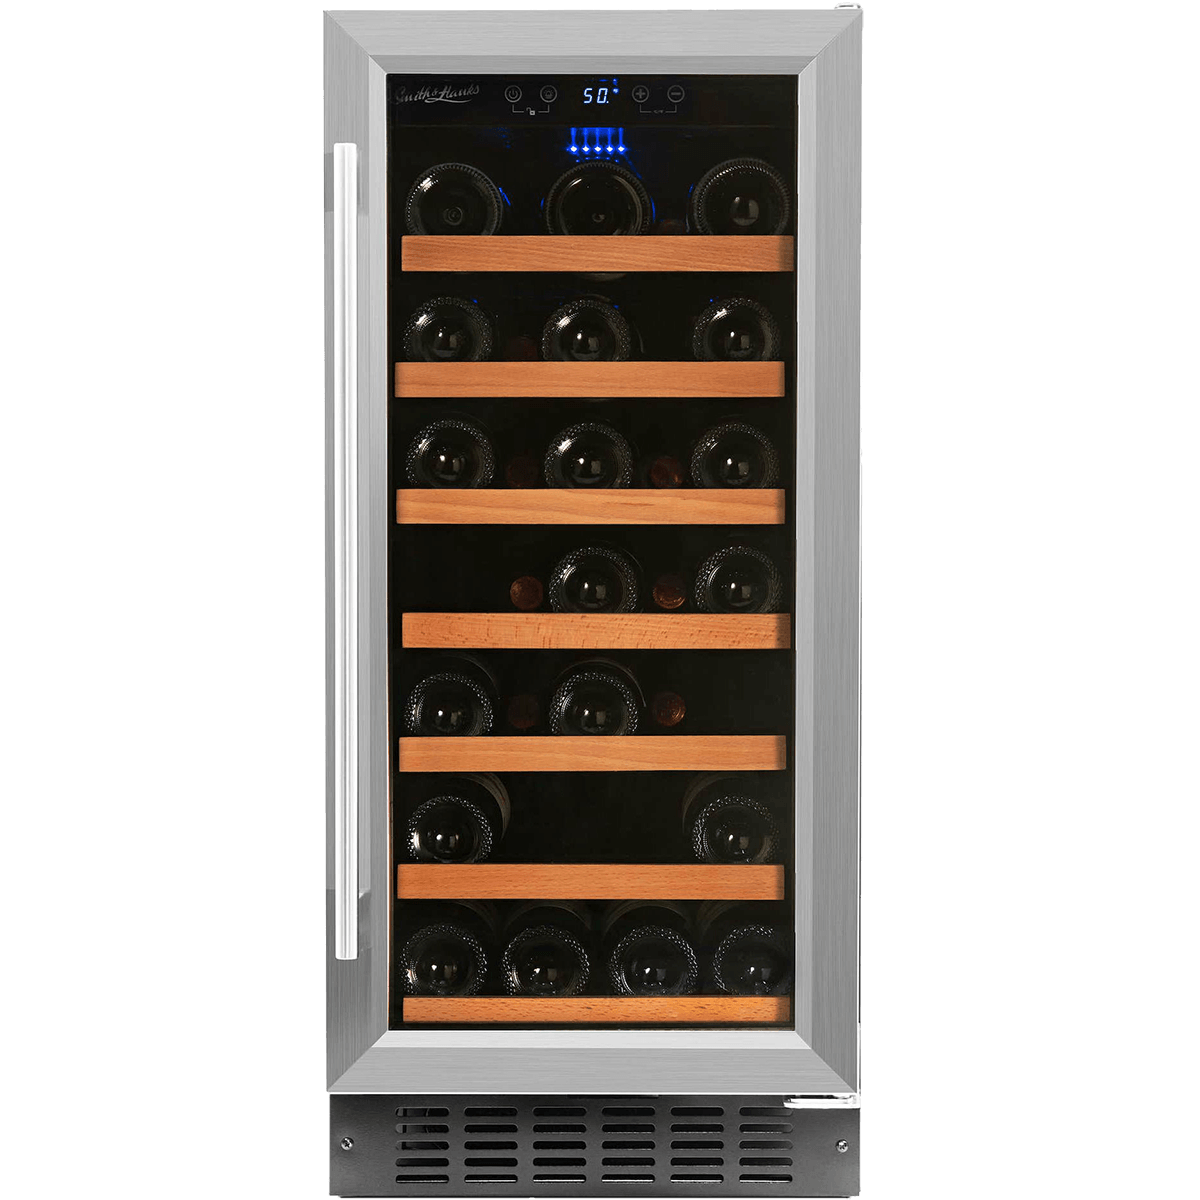 Smith Hanks 34 Bottle Single Zone Wine Cooler Quench Essentials Built In Wine Refrigerator Wine Wine Refrigerator